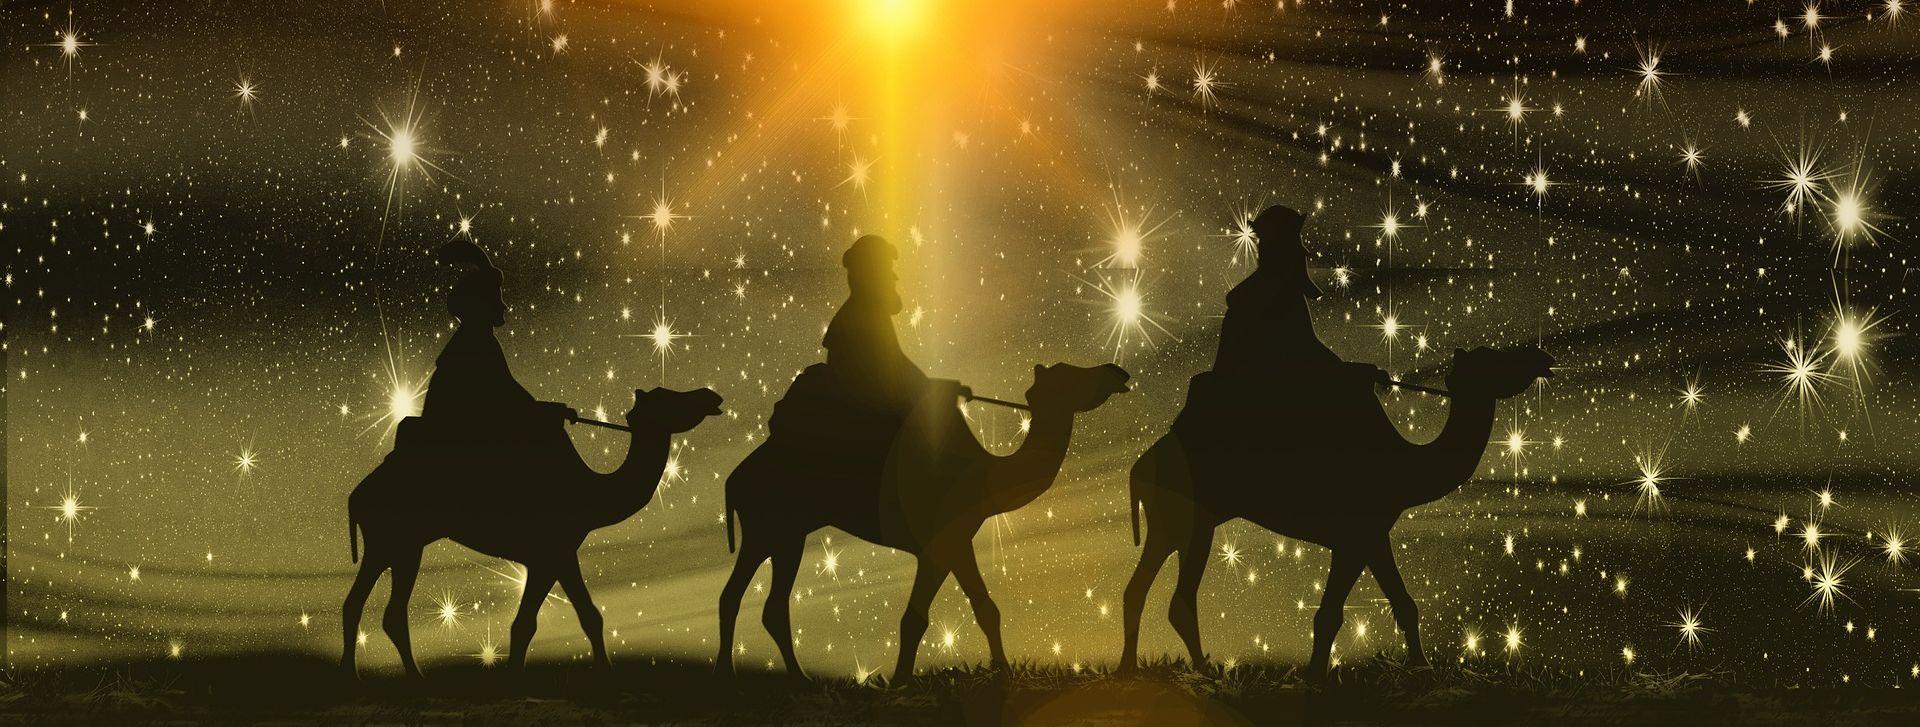 Danas je blagdan Sveta tri kralja, Bogojavljenje i Vodokršće